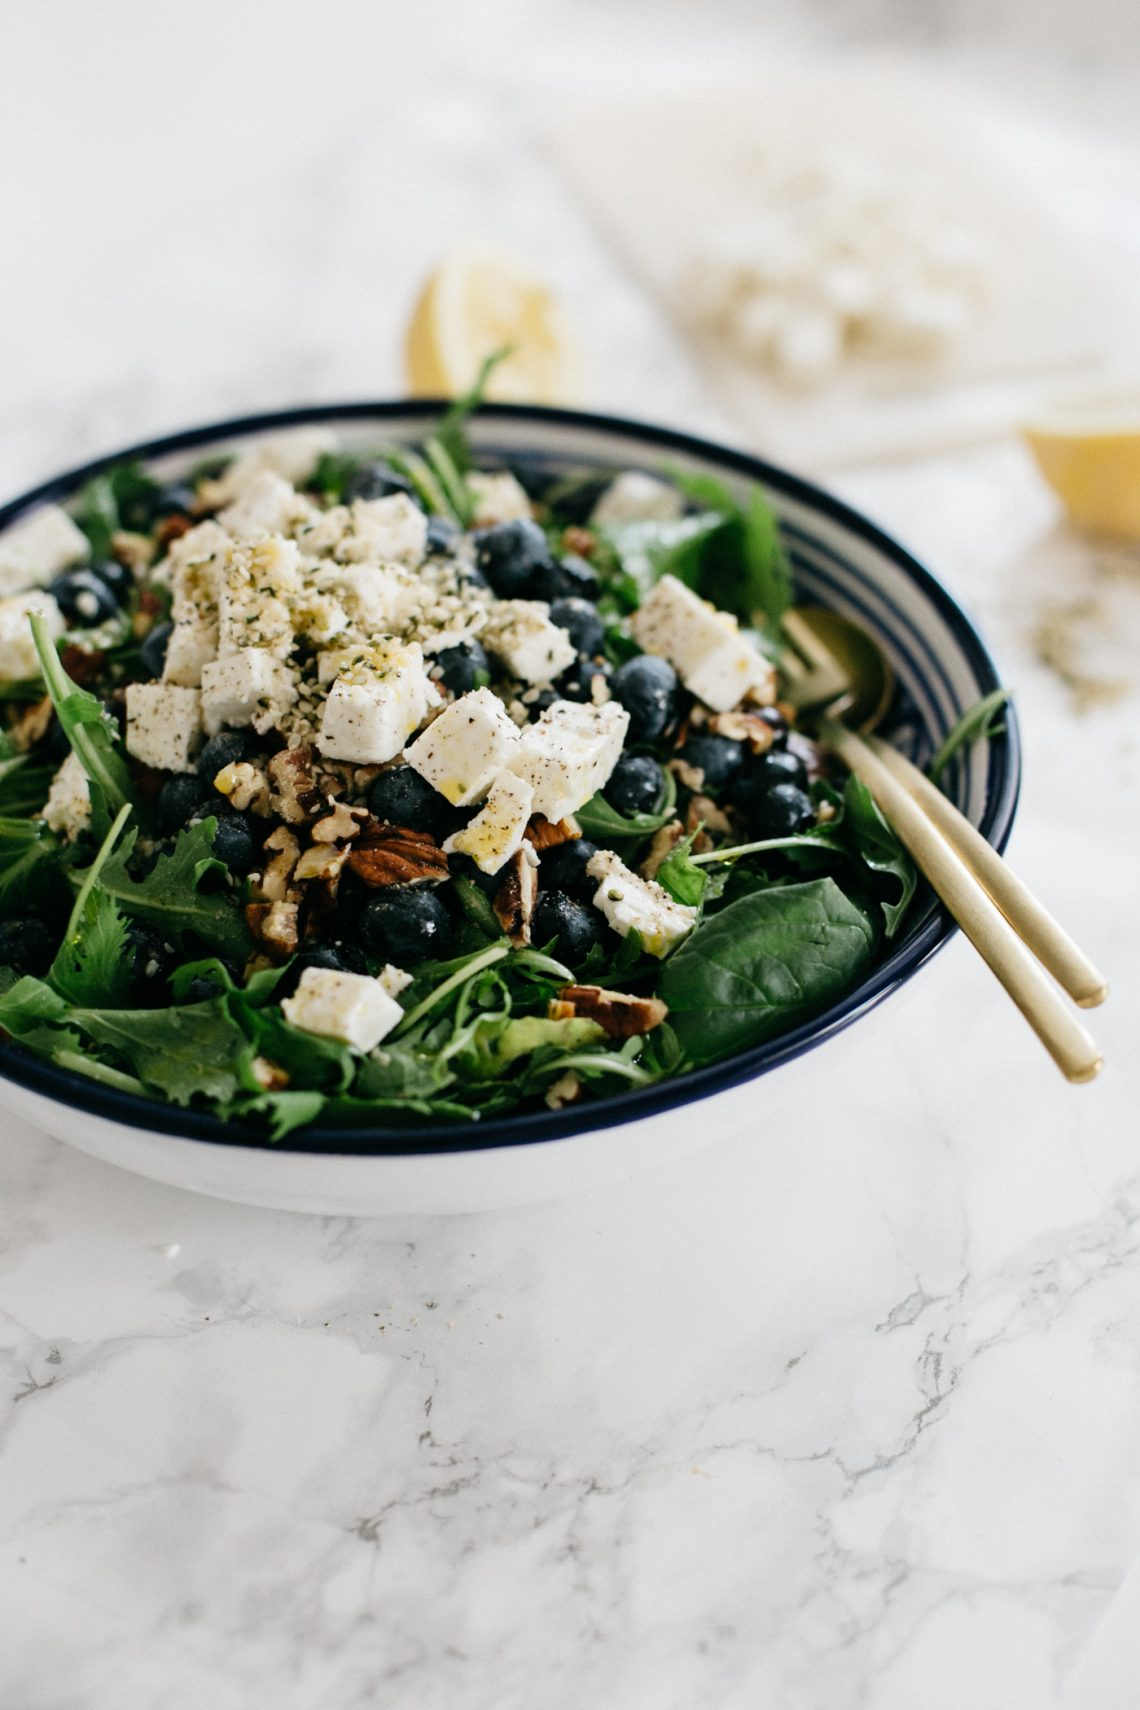 Recipe: California Superfood Salad